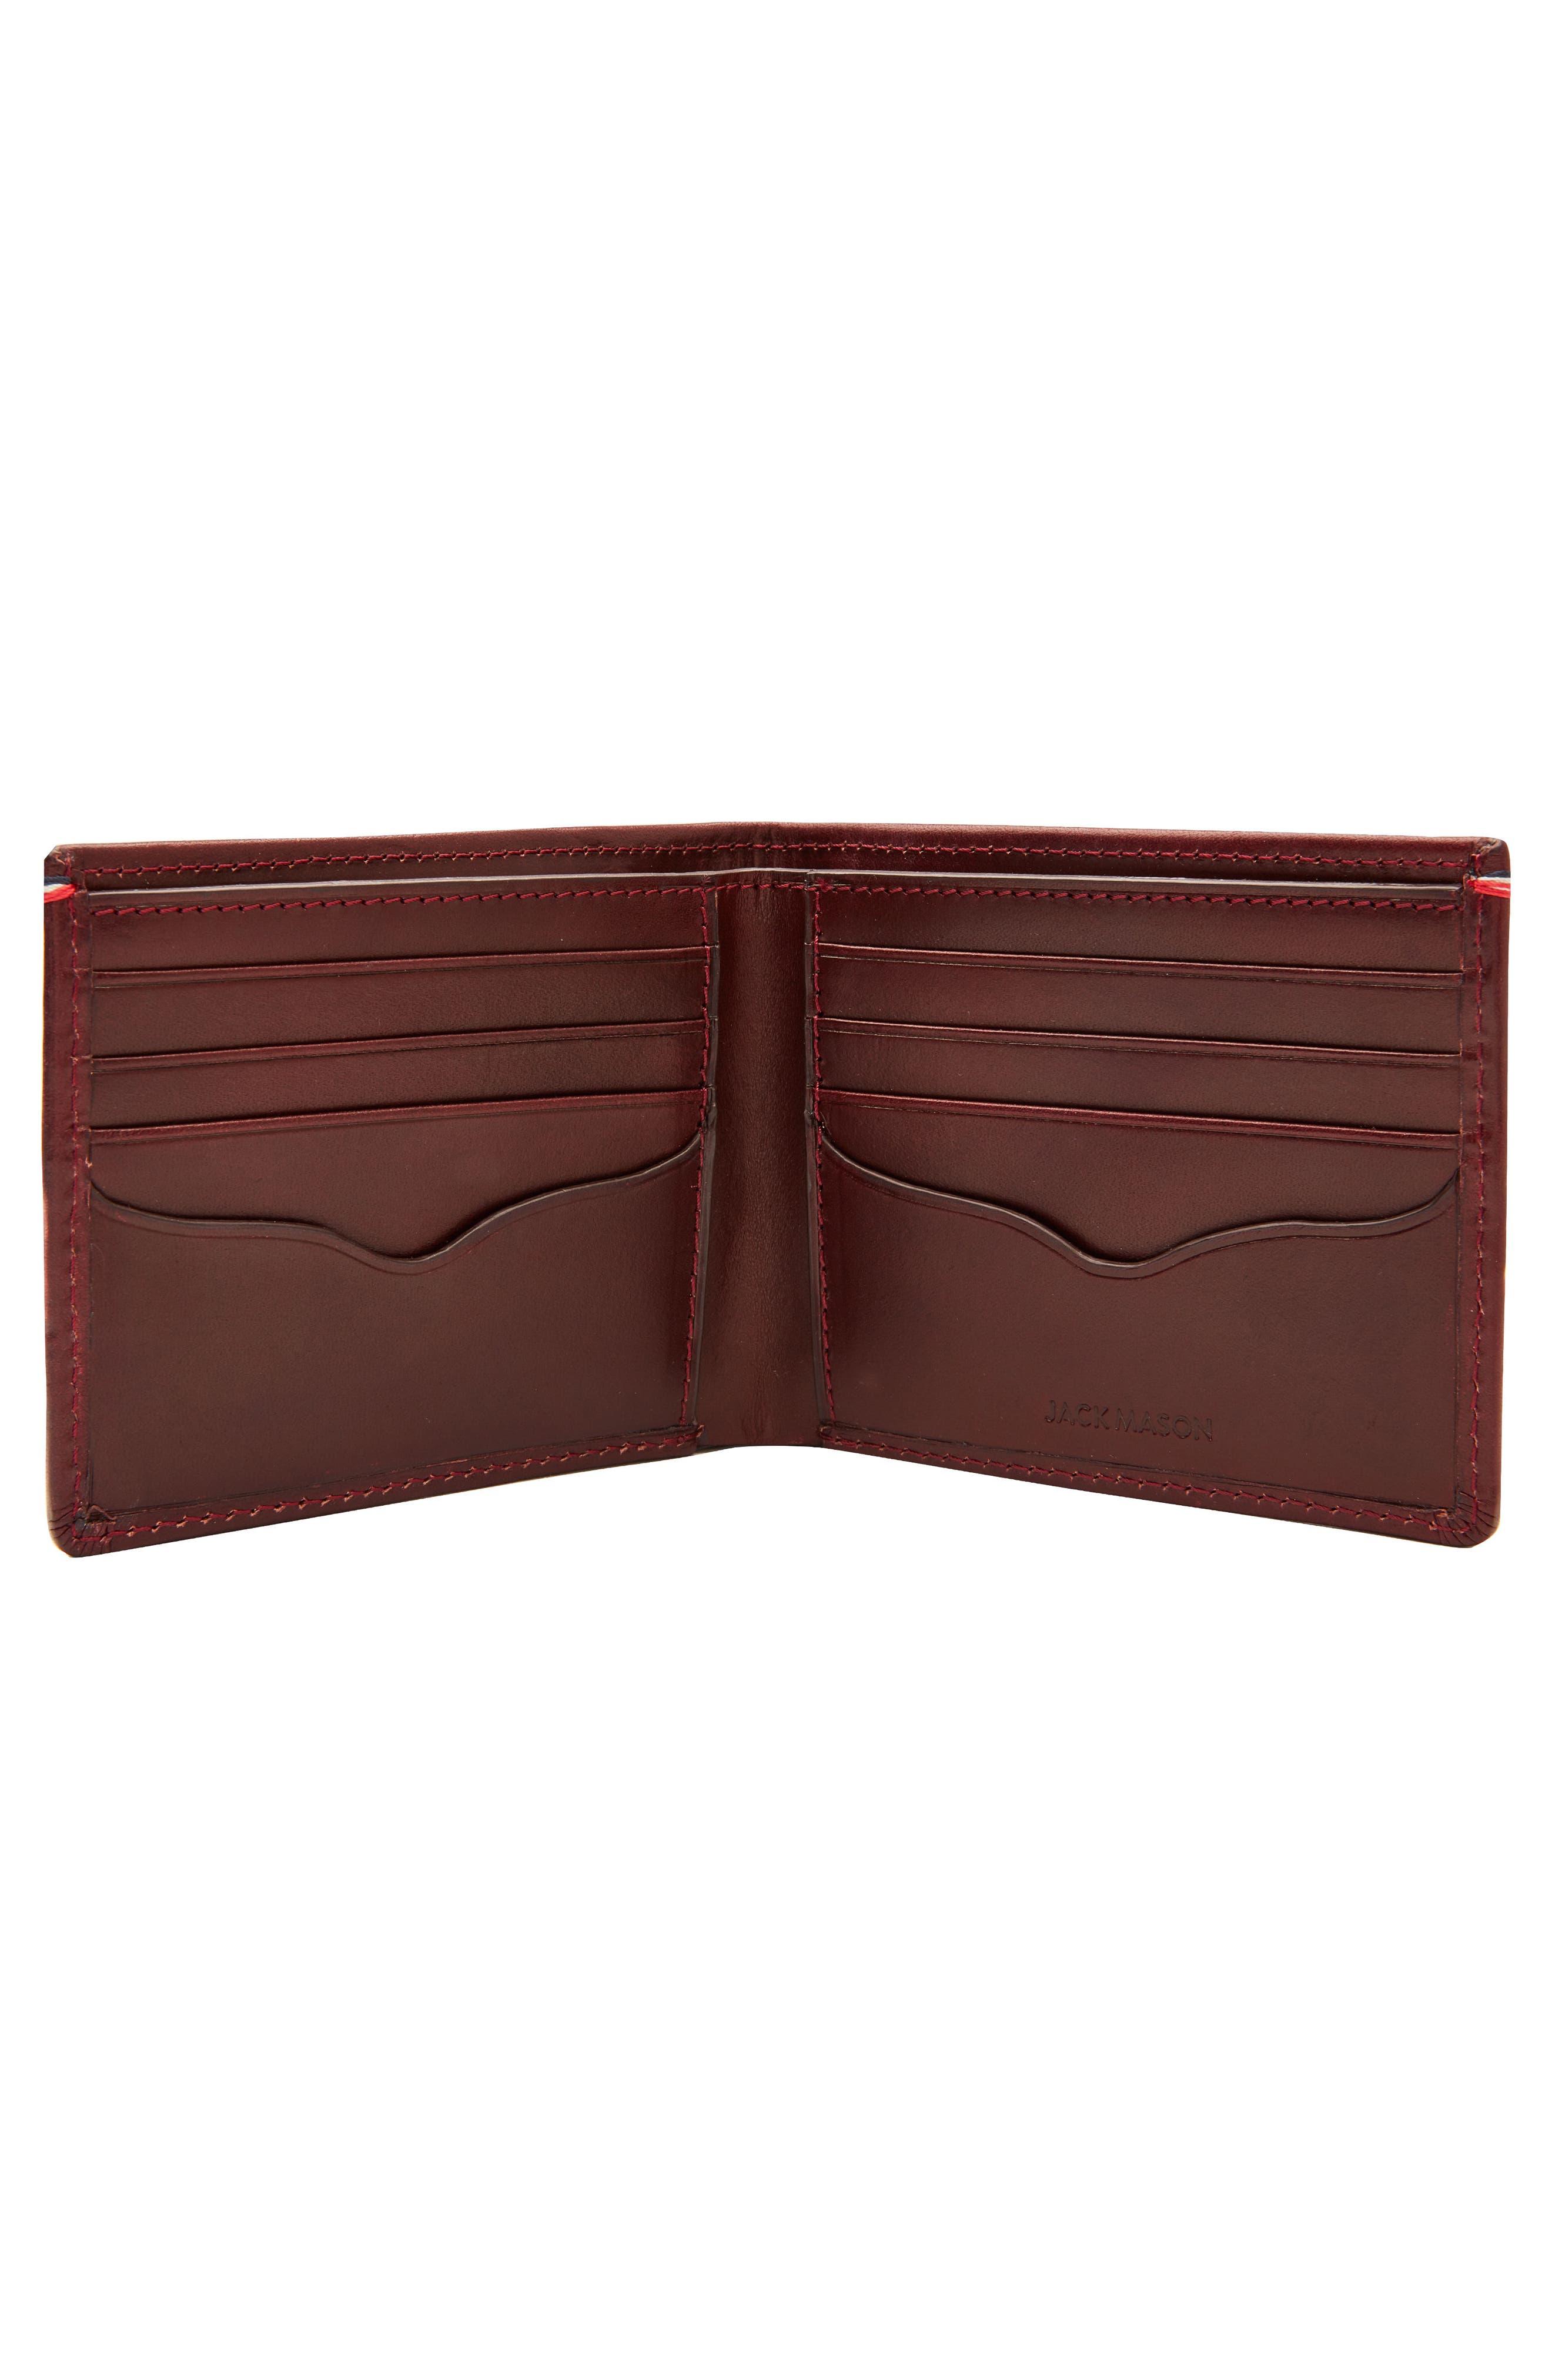 Core Leather Wallet,                             Alternate thumbnail 6, color,